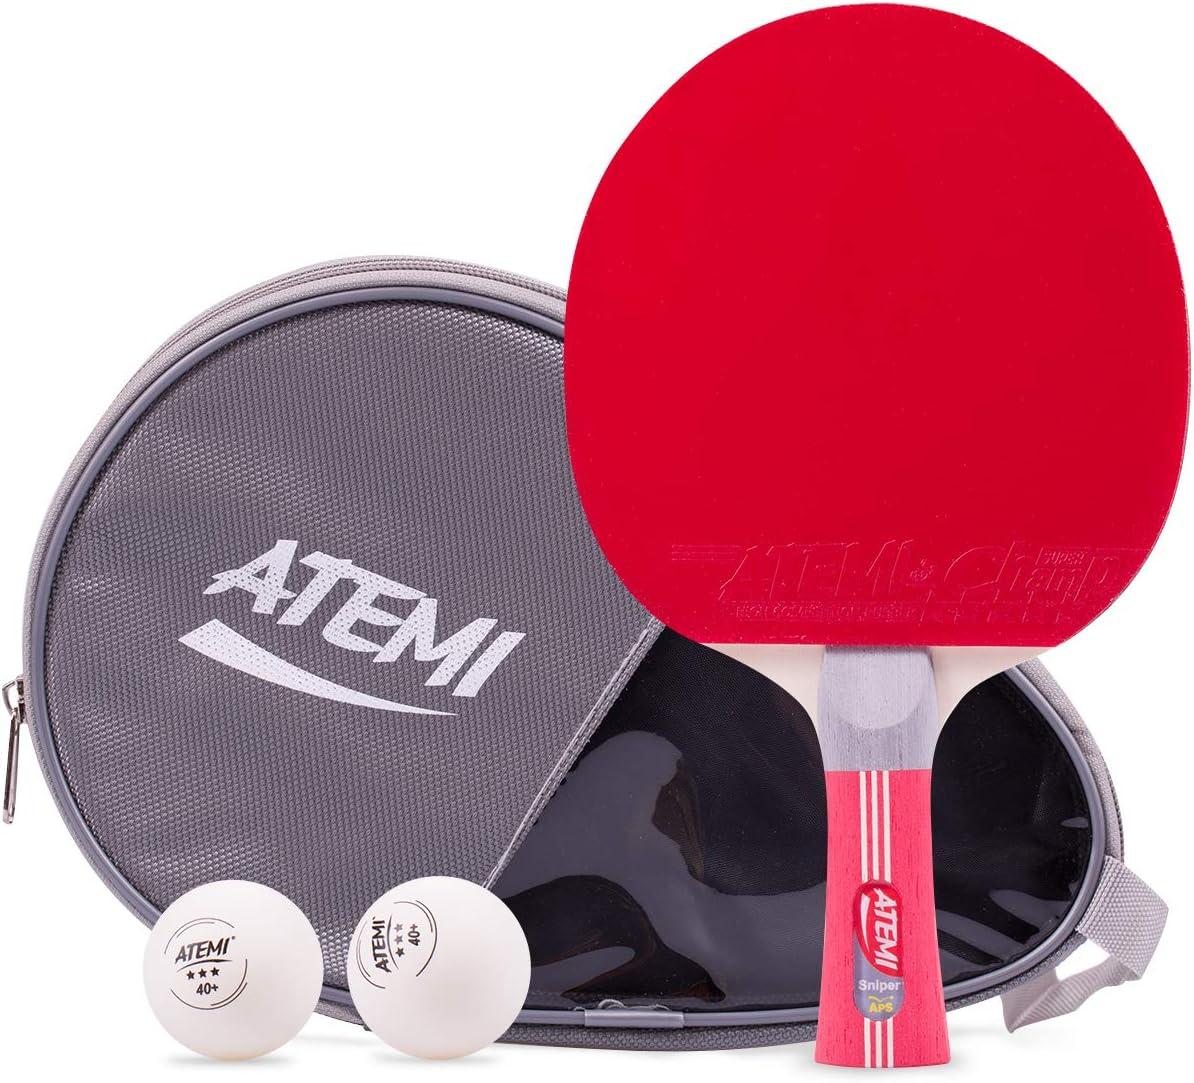 Atemi Sniper 5-Star 5 2021 new popular Table Tennis Set 3-Piece Bat 5-Pl Bundle